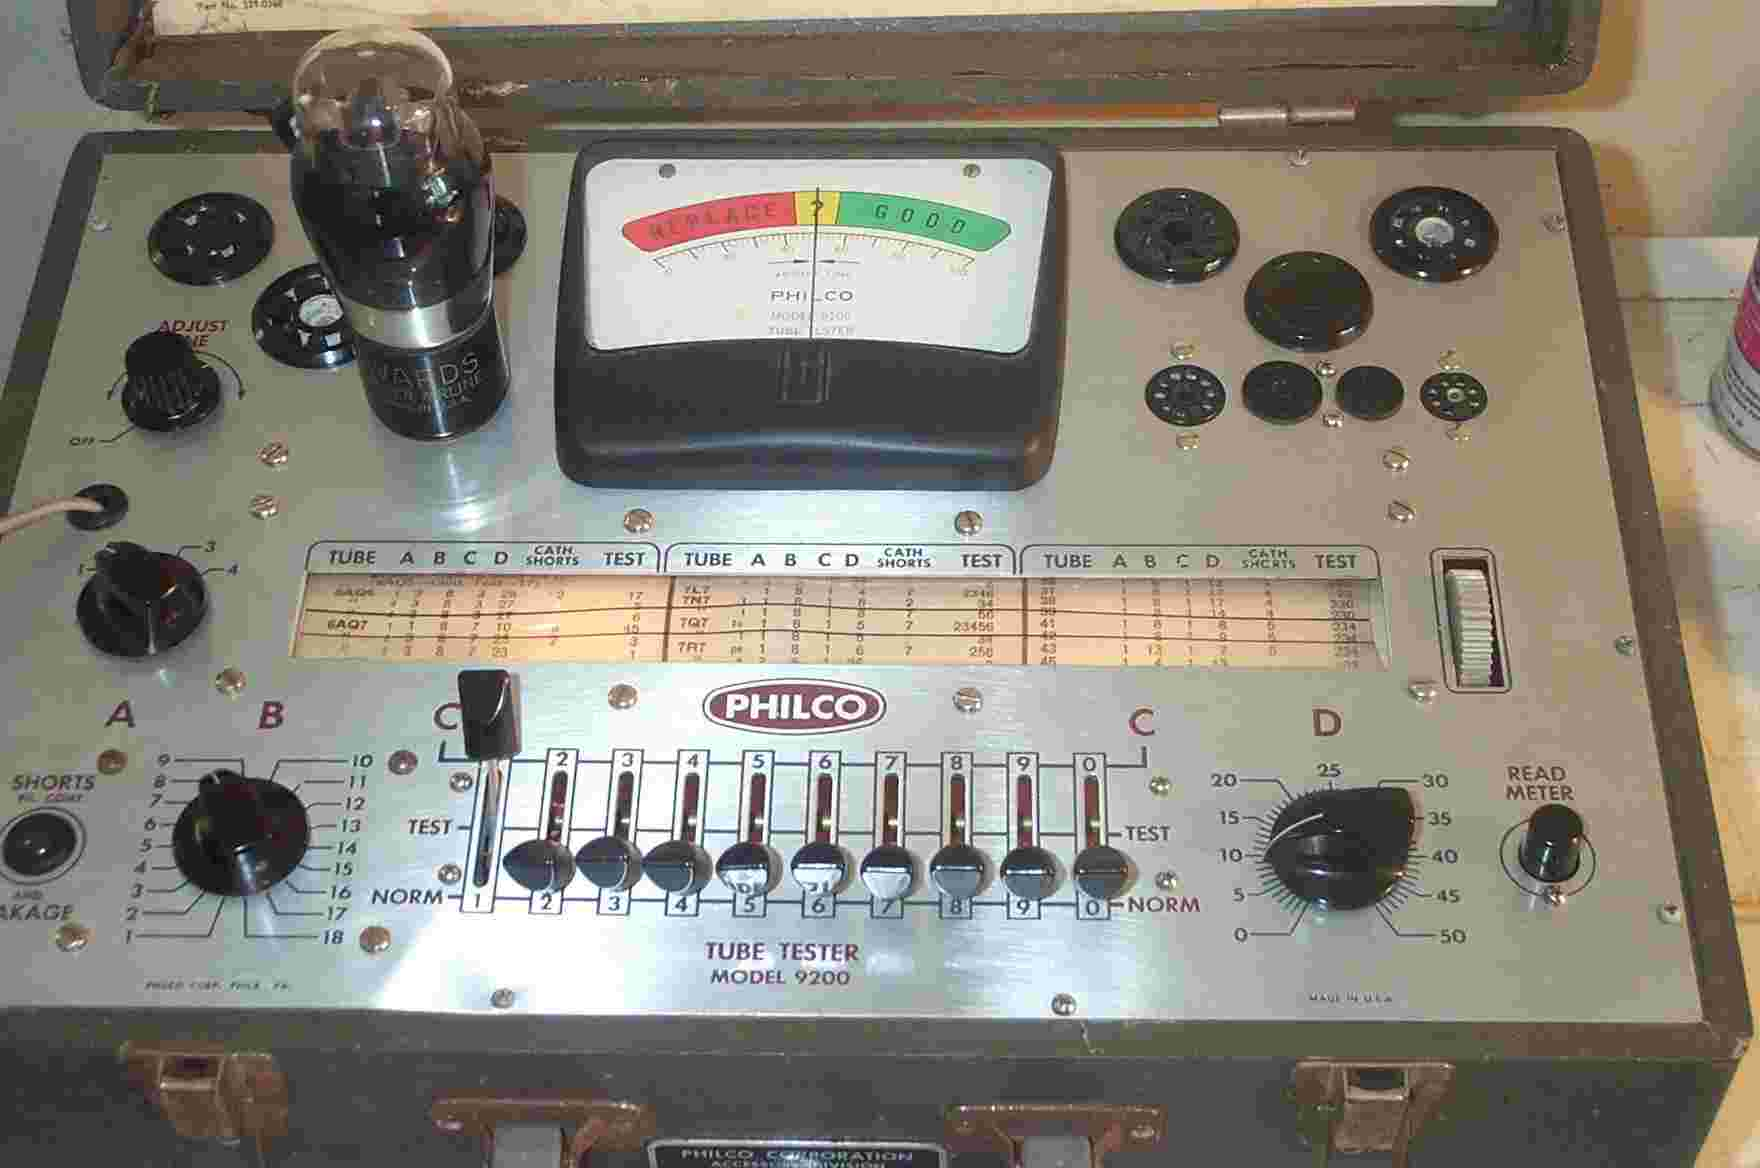 Radio Shack Capacitance Meter : Capacitor tester radio shack images